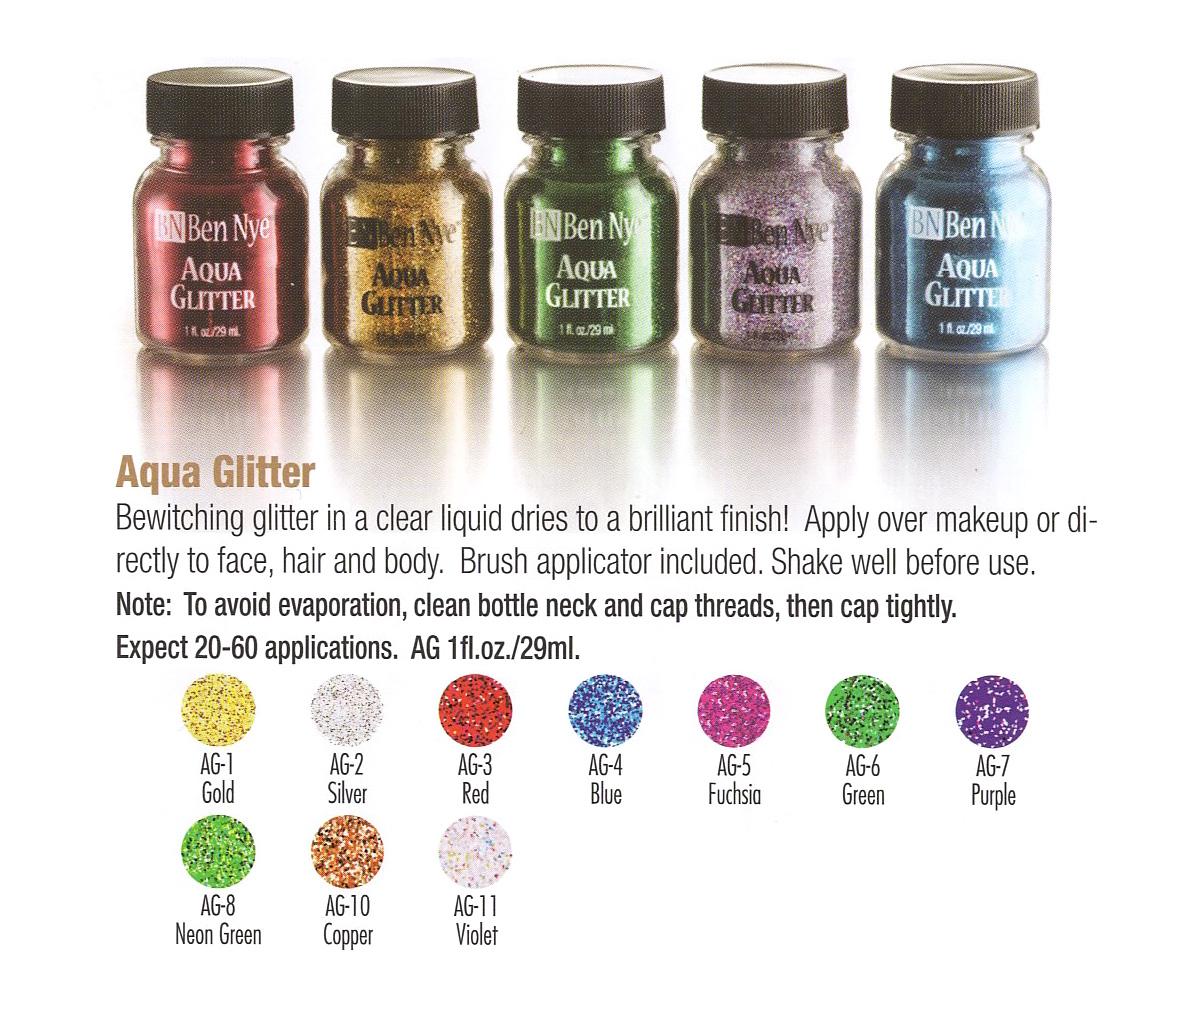 Ben Nye - Aqua Glitter